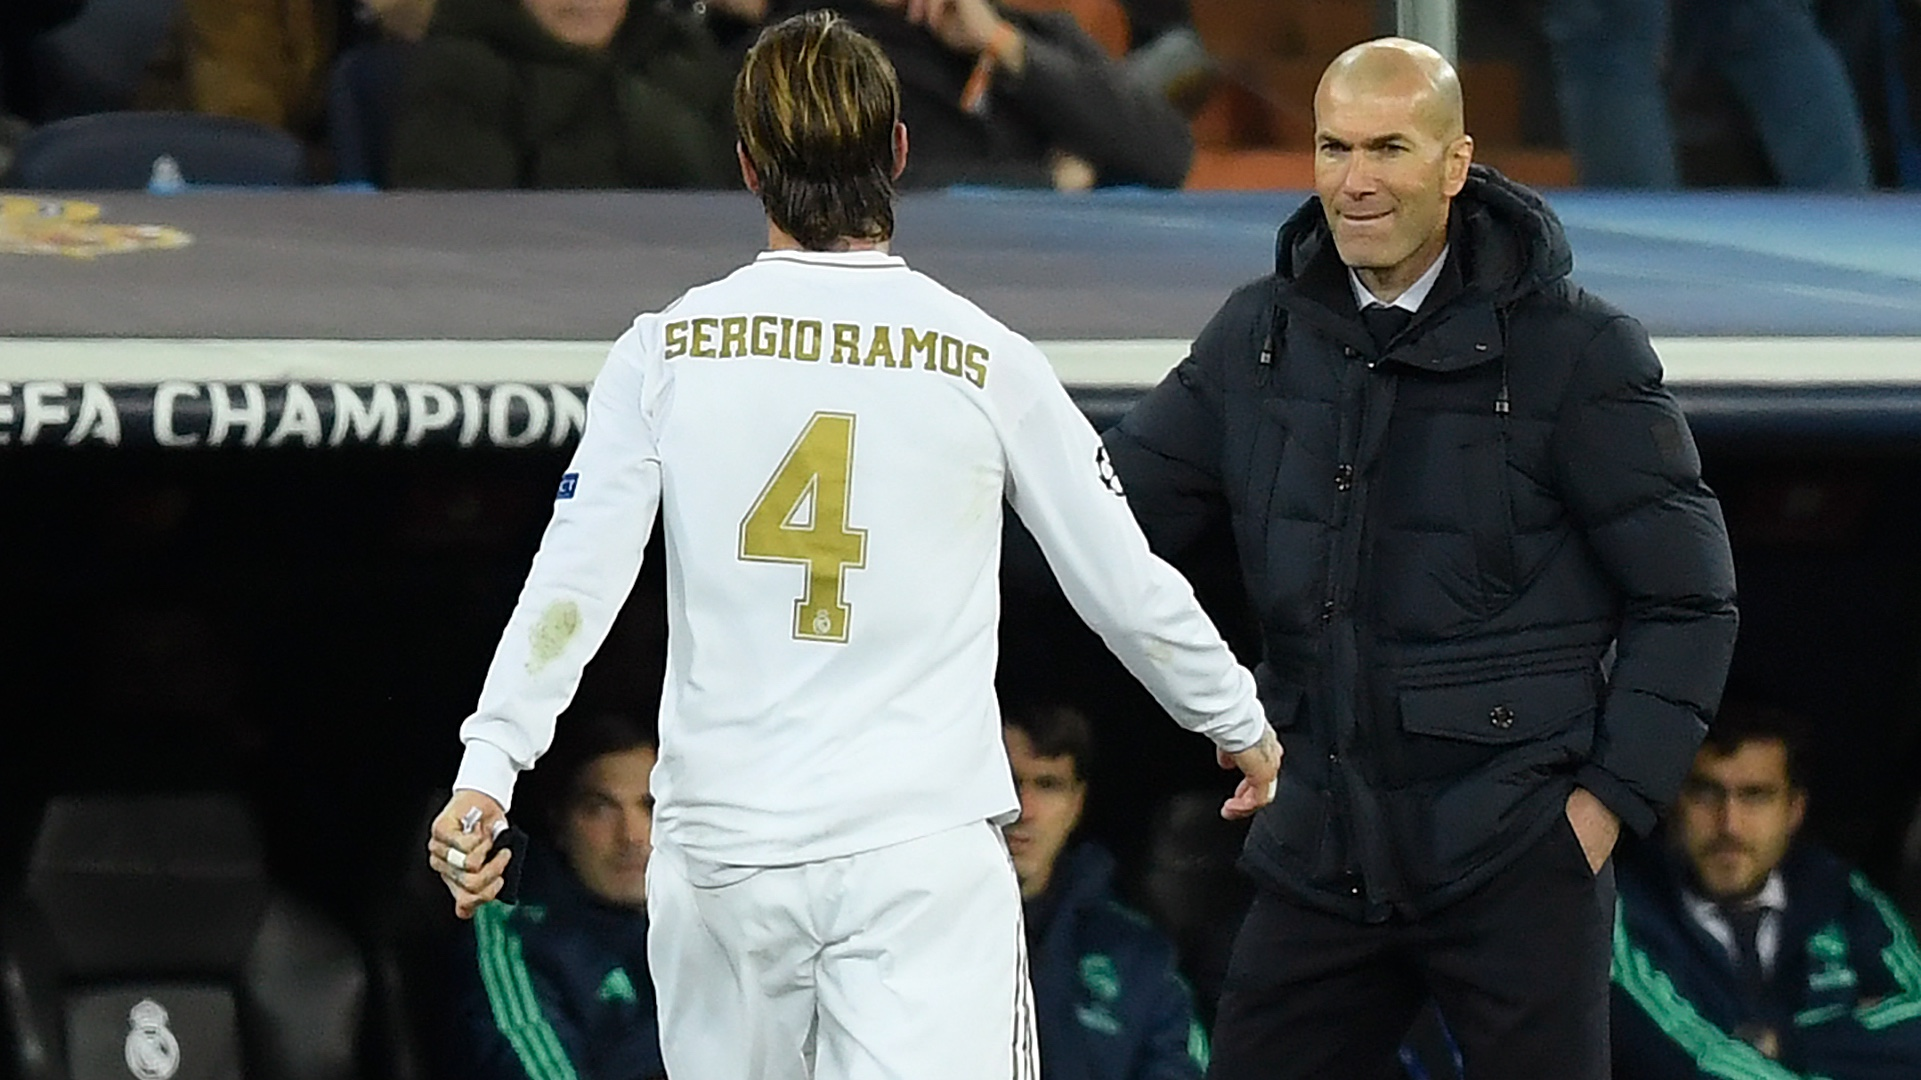 Zidane veut voir Sergio Ramos prendre sa retraite au Real Madrid